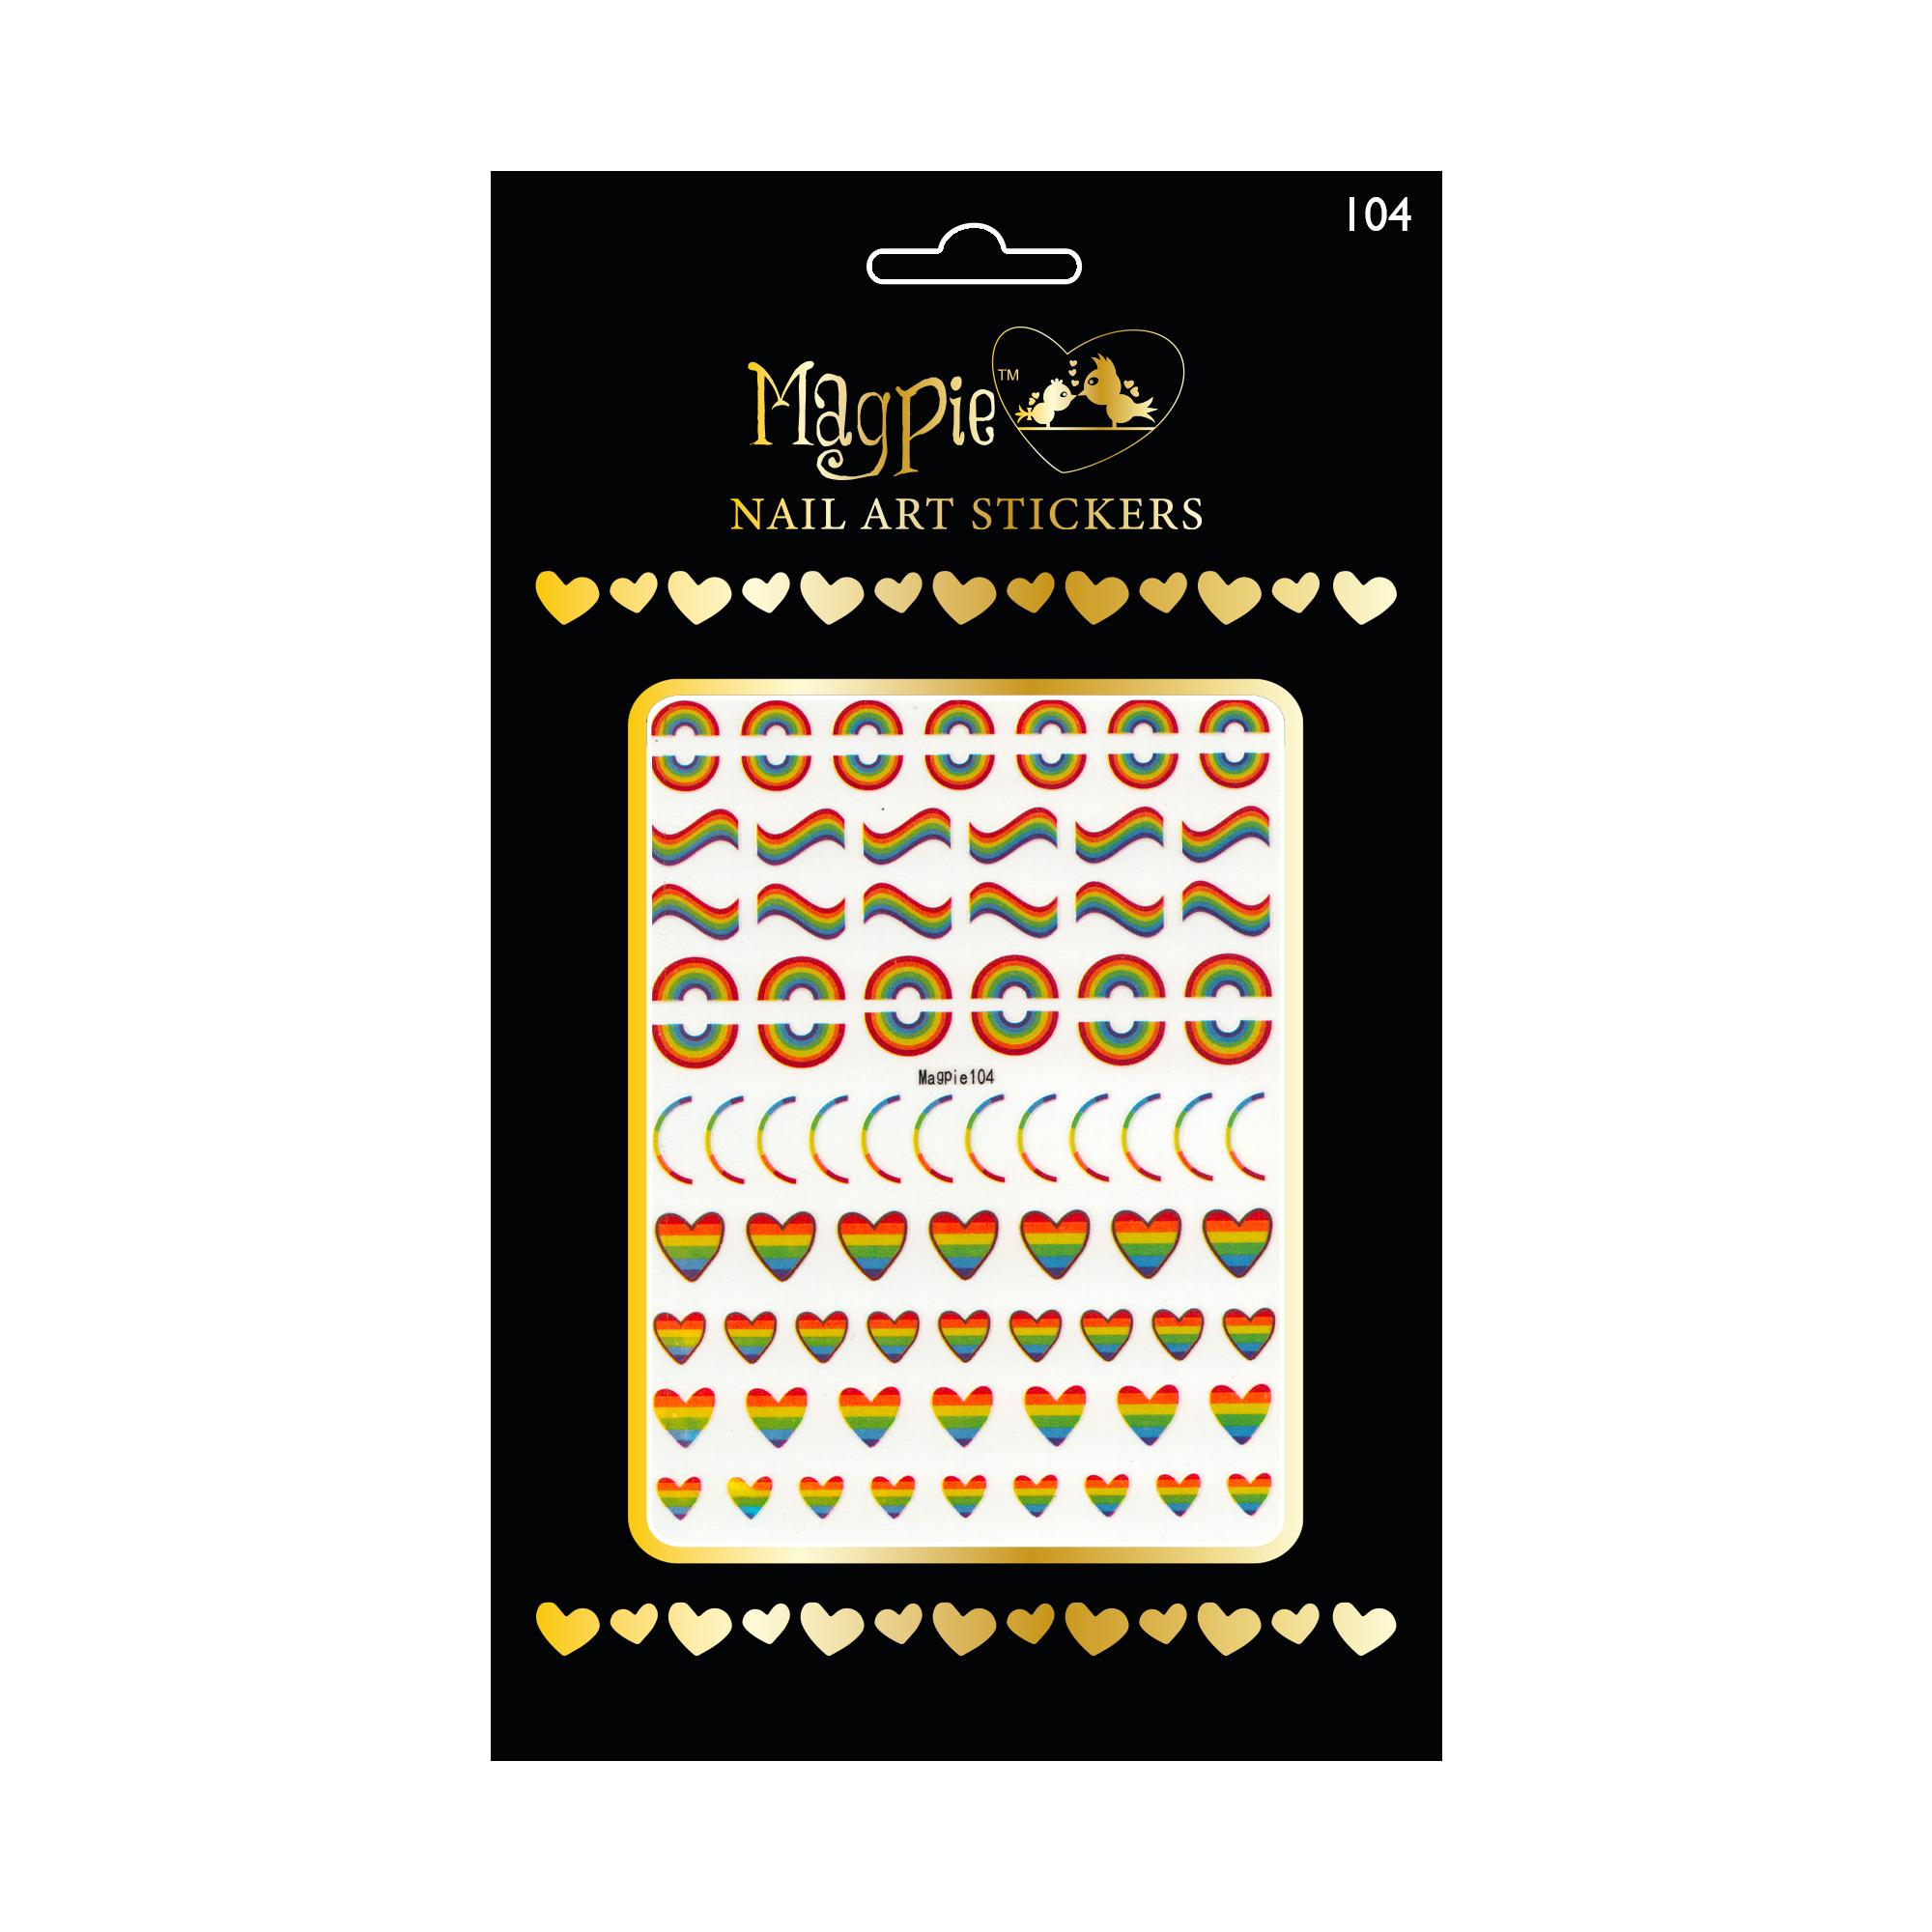 Magpie 104 stickers